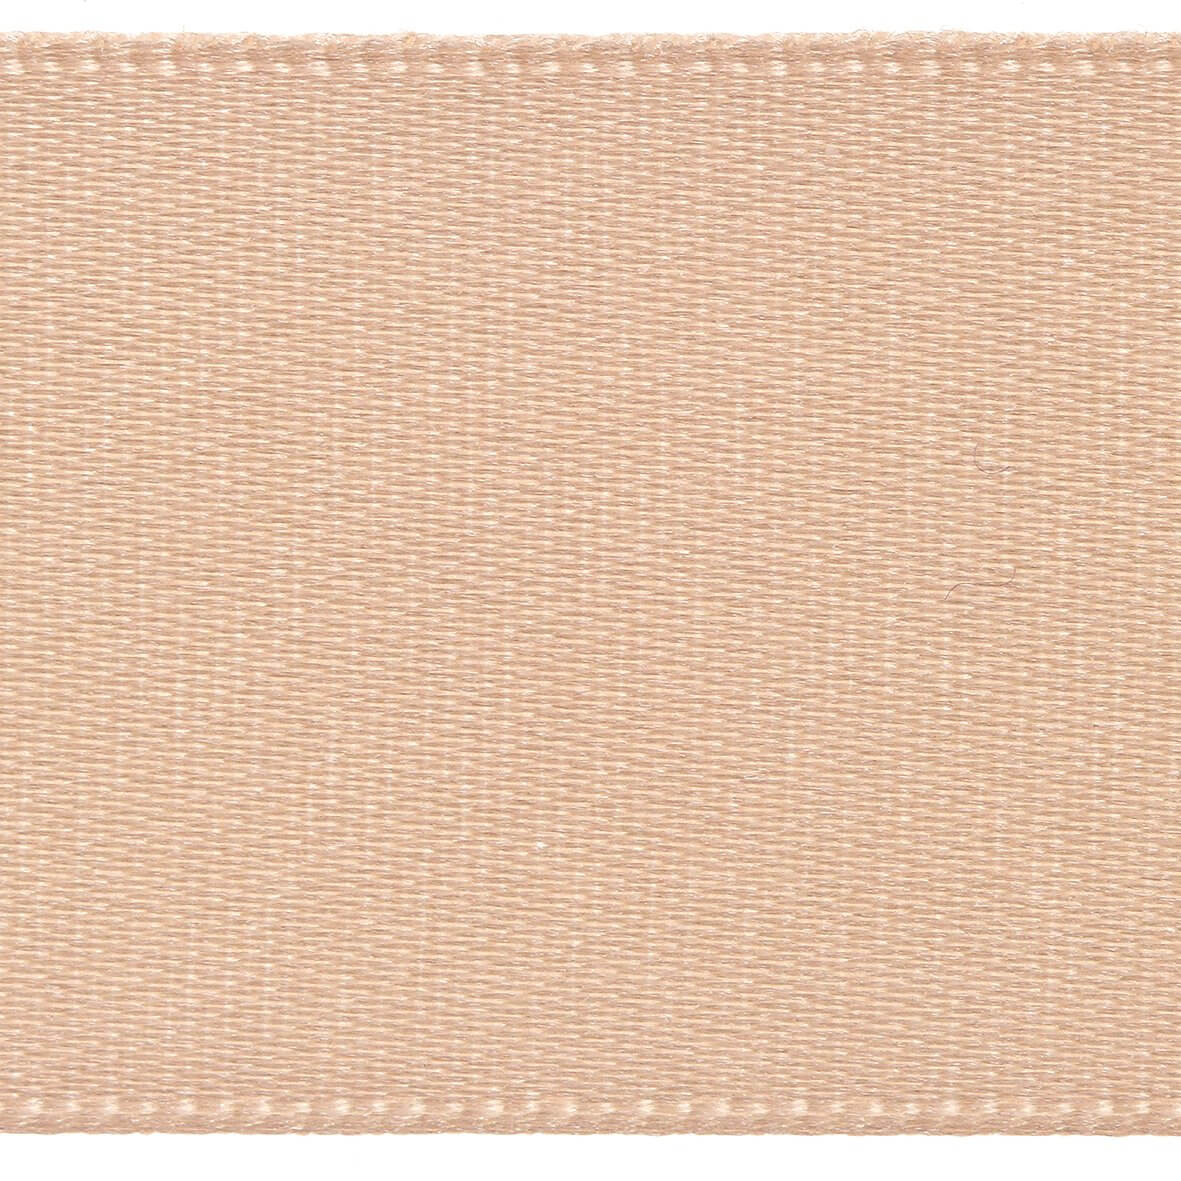 10mm Berisfords Satin Ribbon - Peach Colour 71